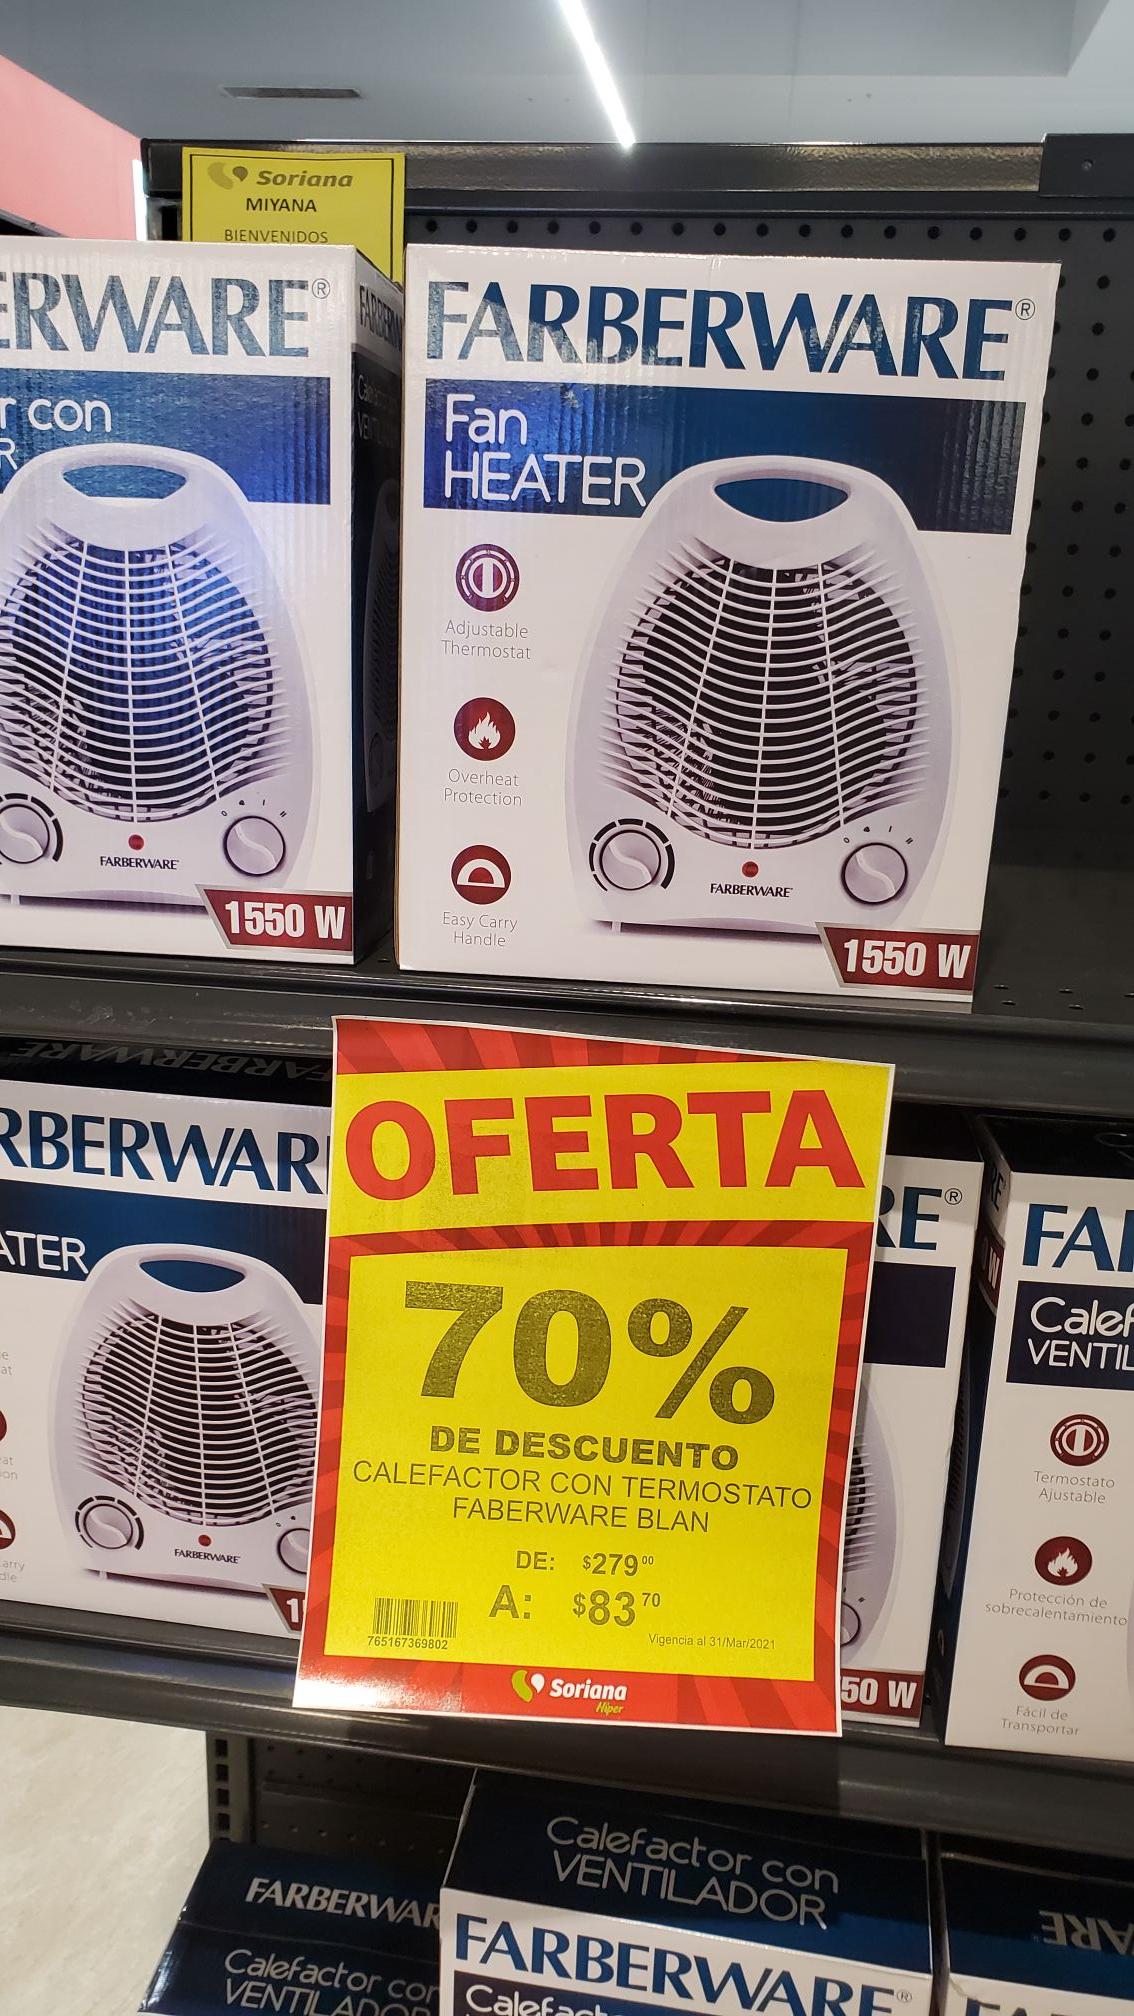 Soriana, Calefactor con termostato faberware blan